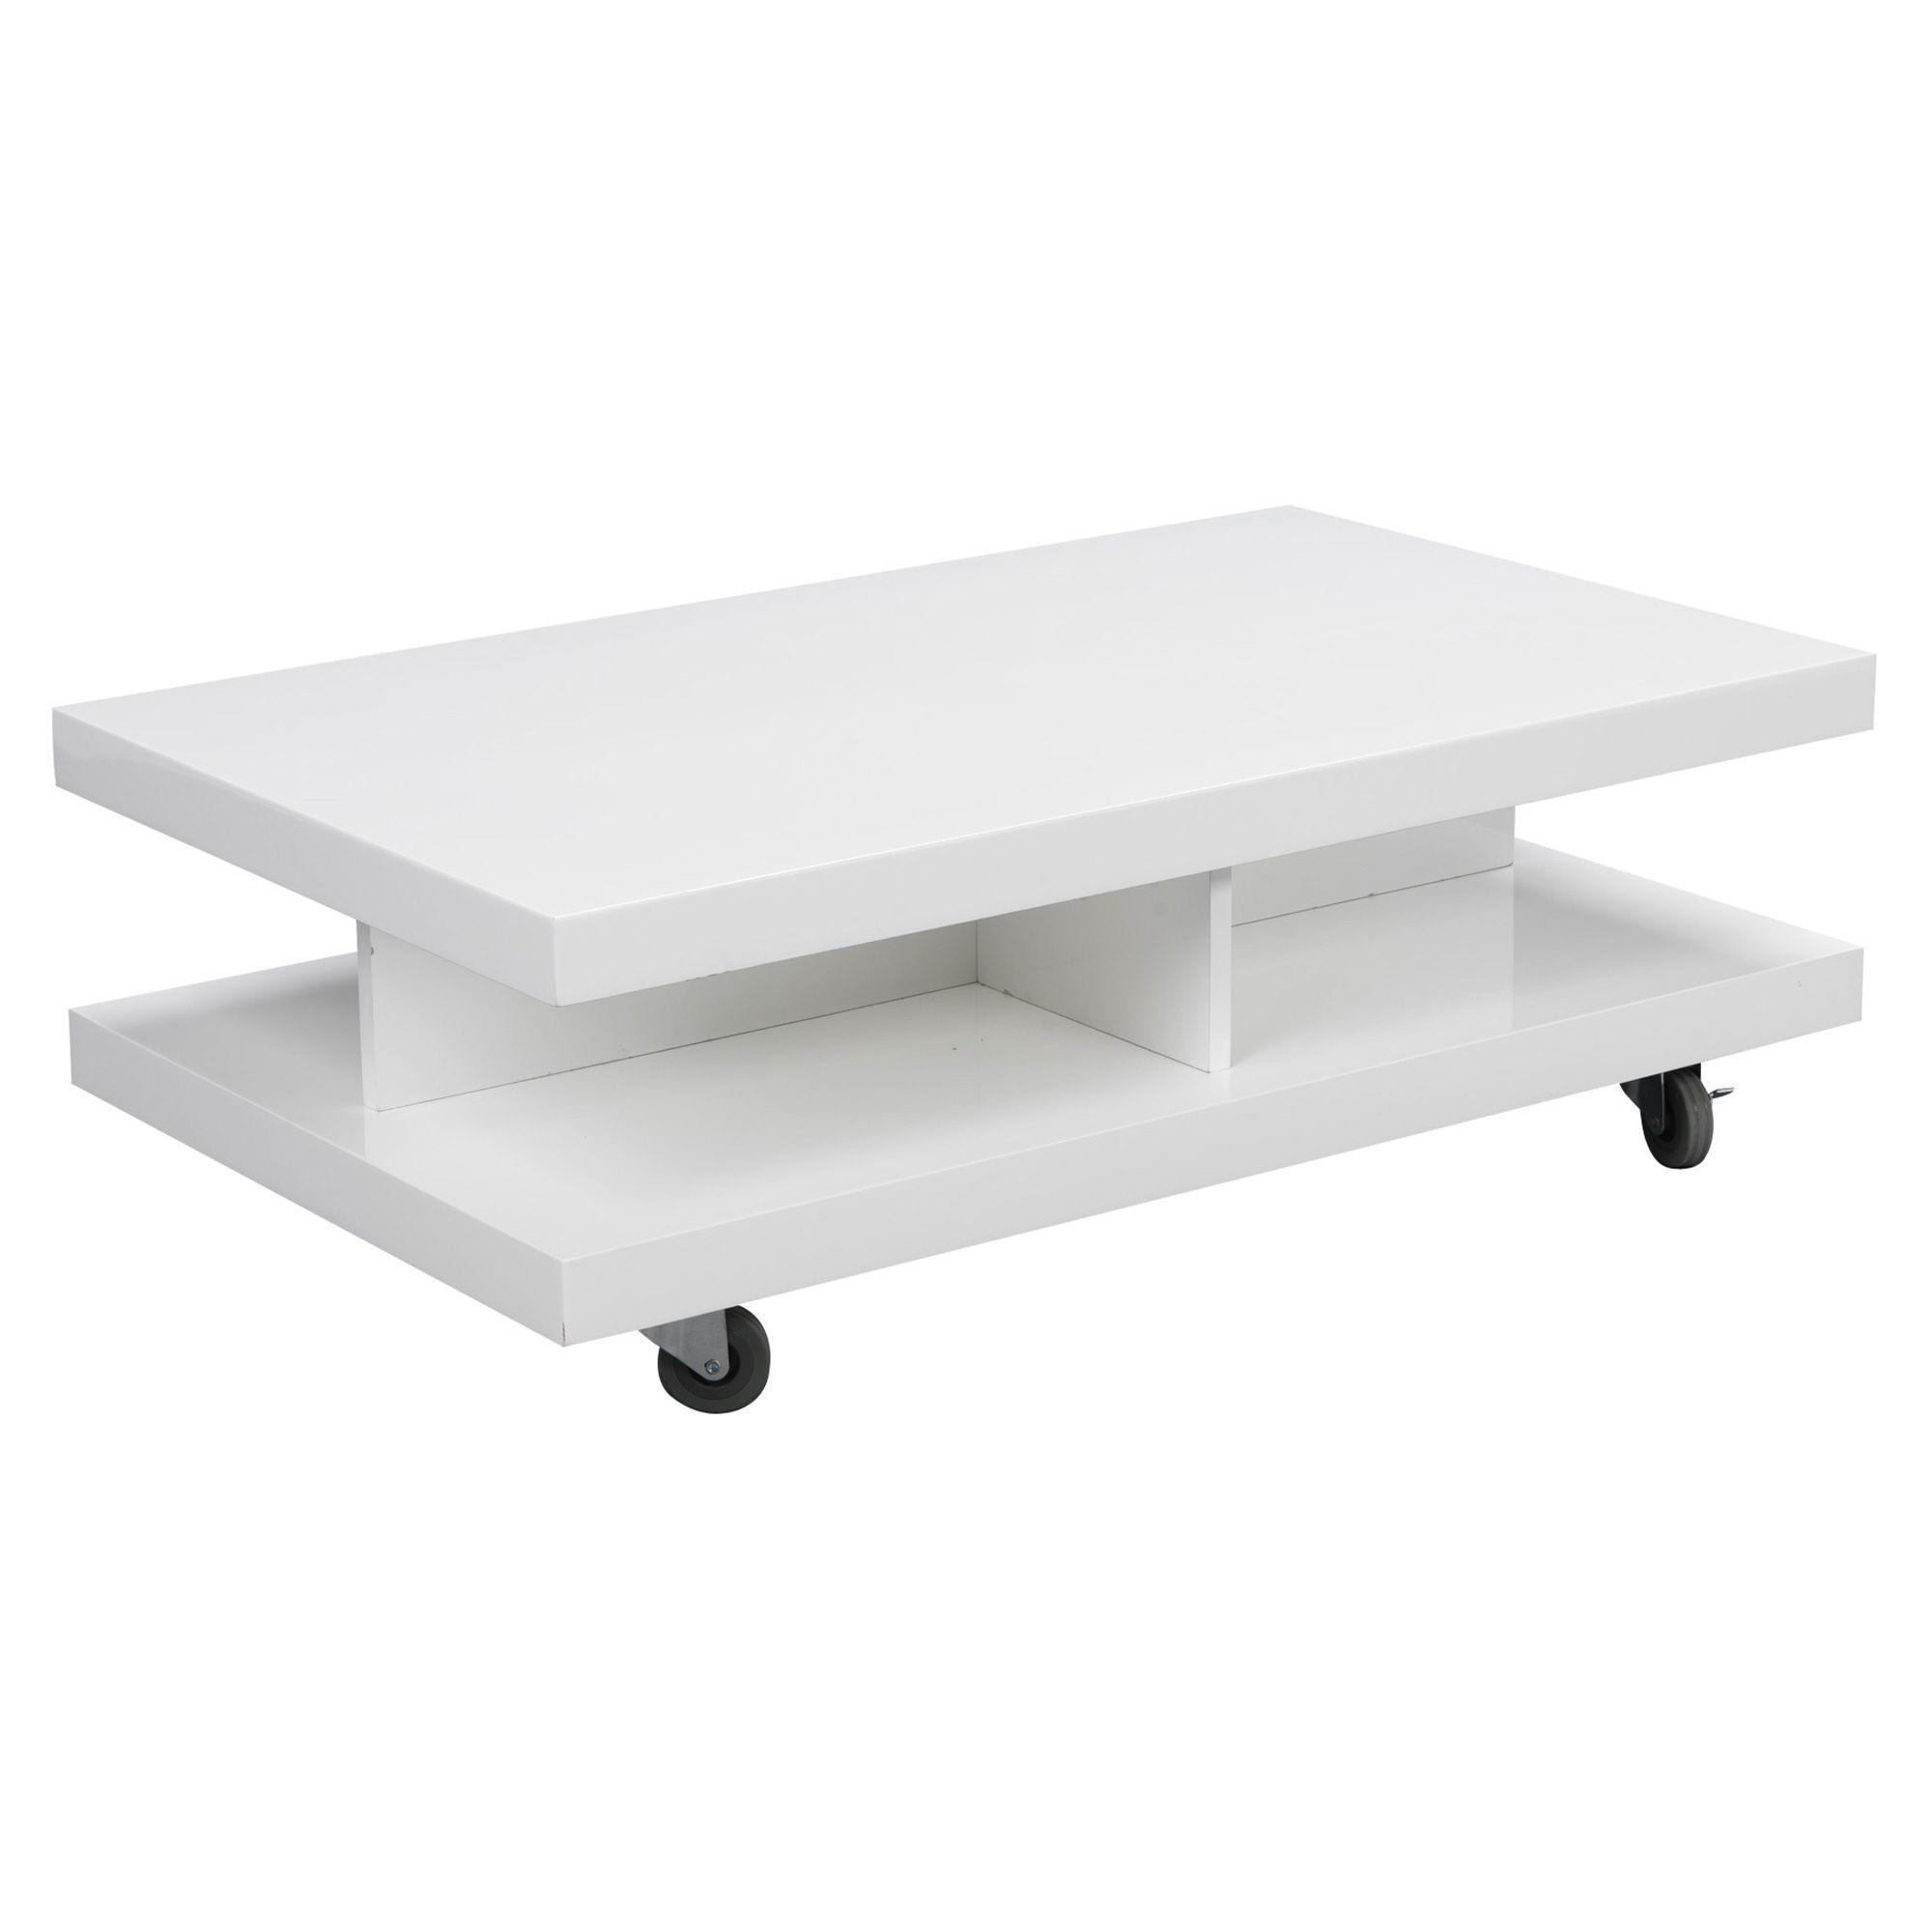 luxus table basse de salon alinea id es de conception de table basse. Black Bedroom Furniture Sets. Home Design Ideas